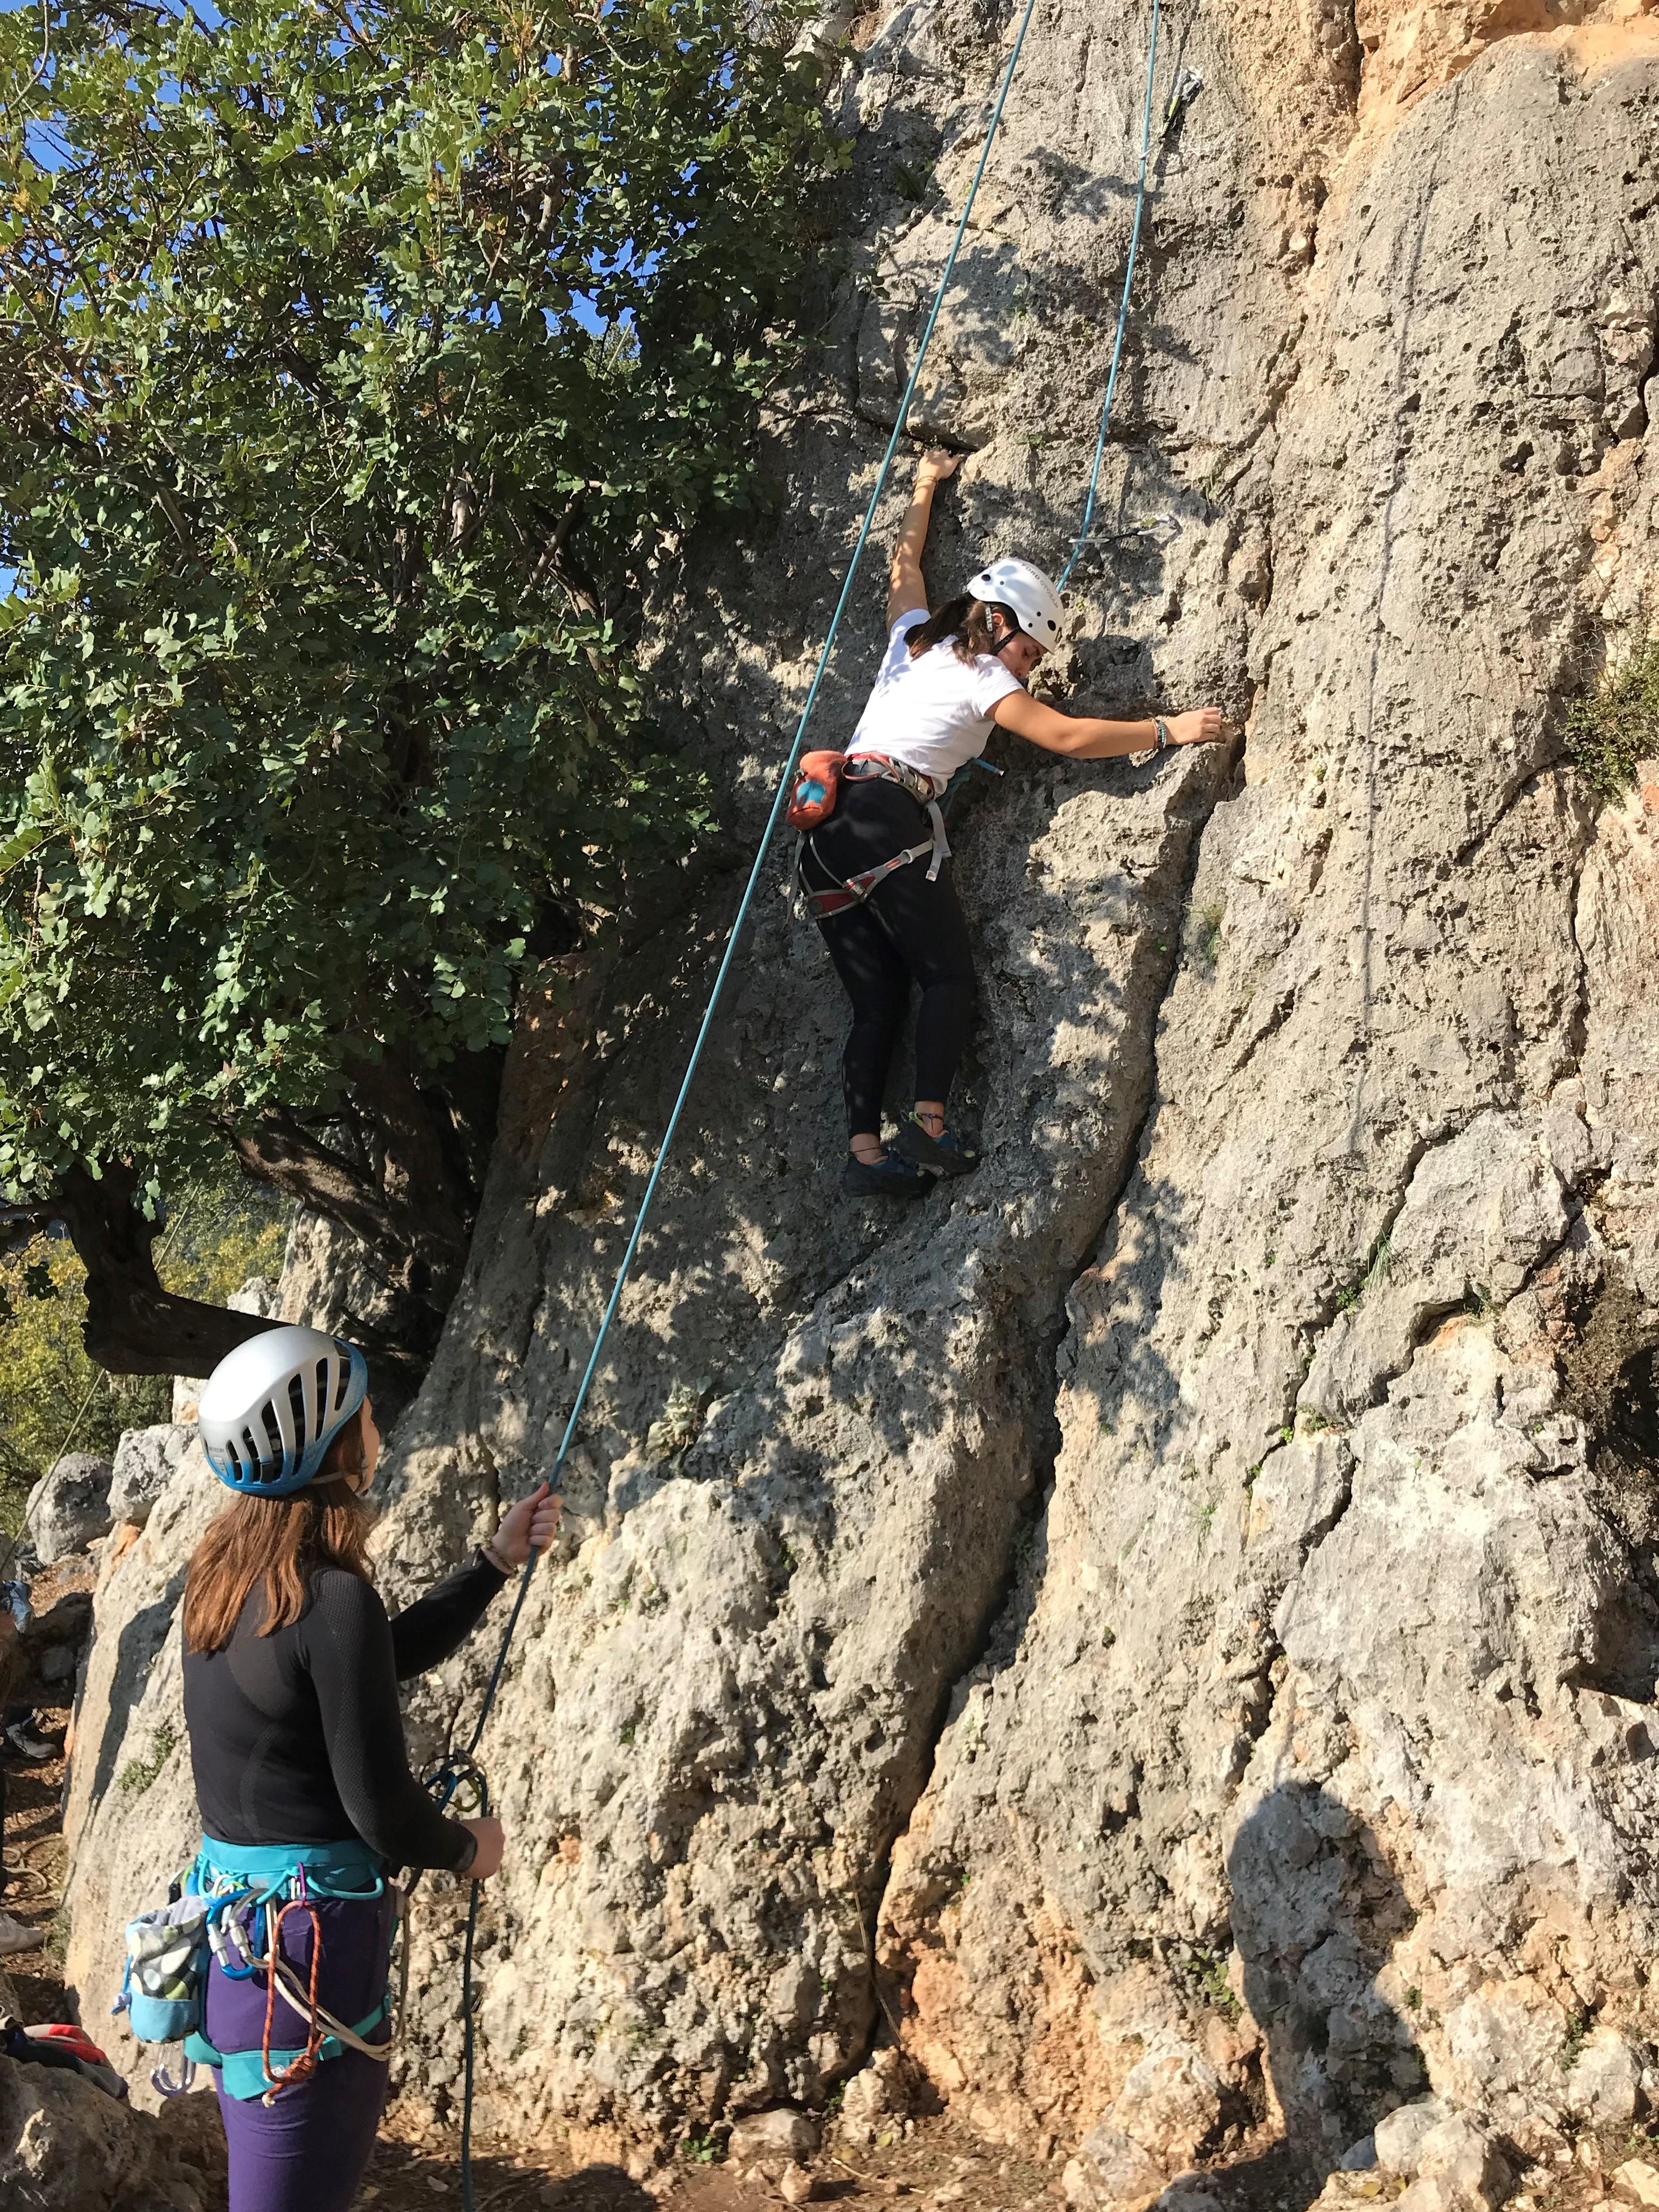 geyikbayırı top rope (üstten emniyetli) tırmanış